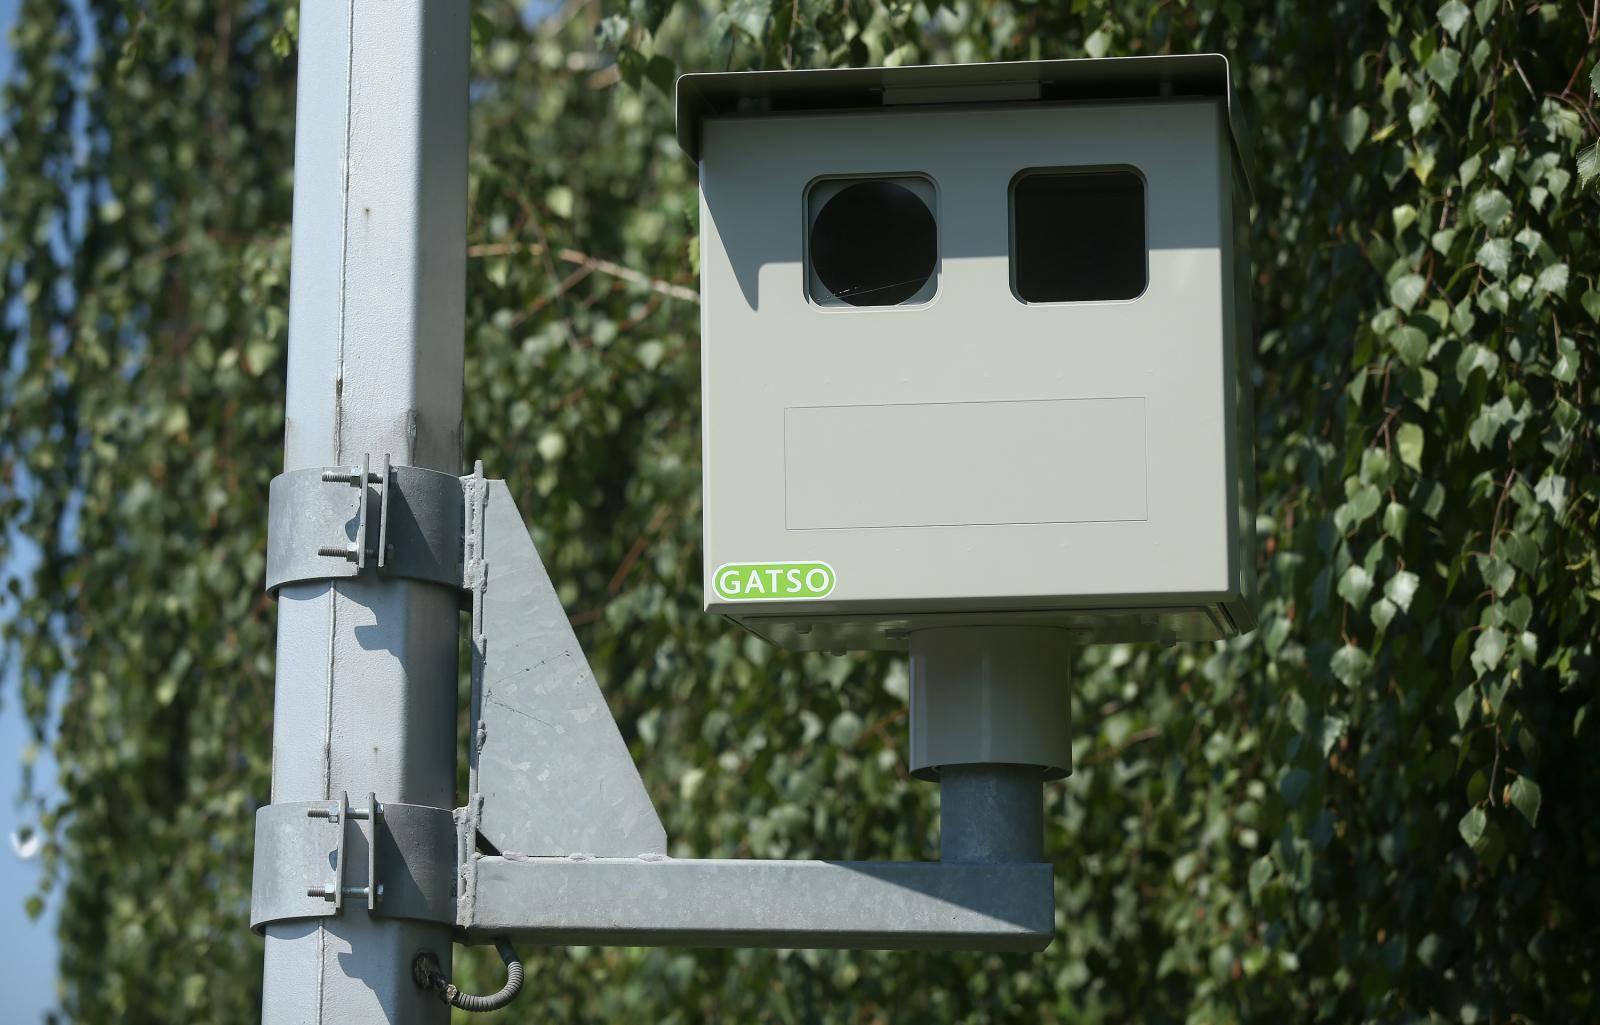 Pazite kako vozite: Na autoput stiže 1088 novih superkamera!